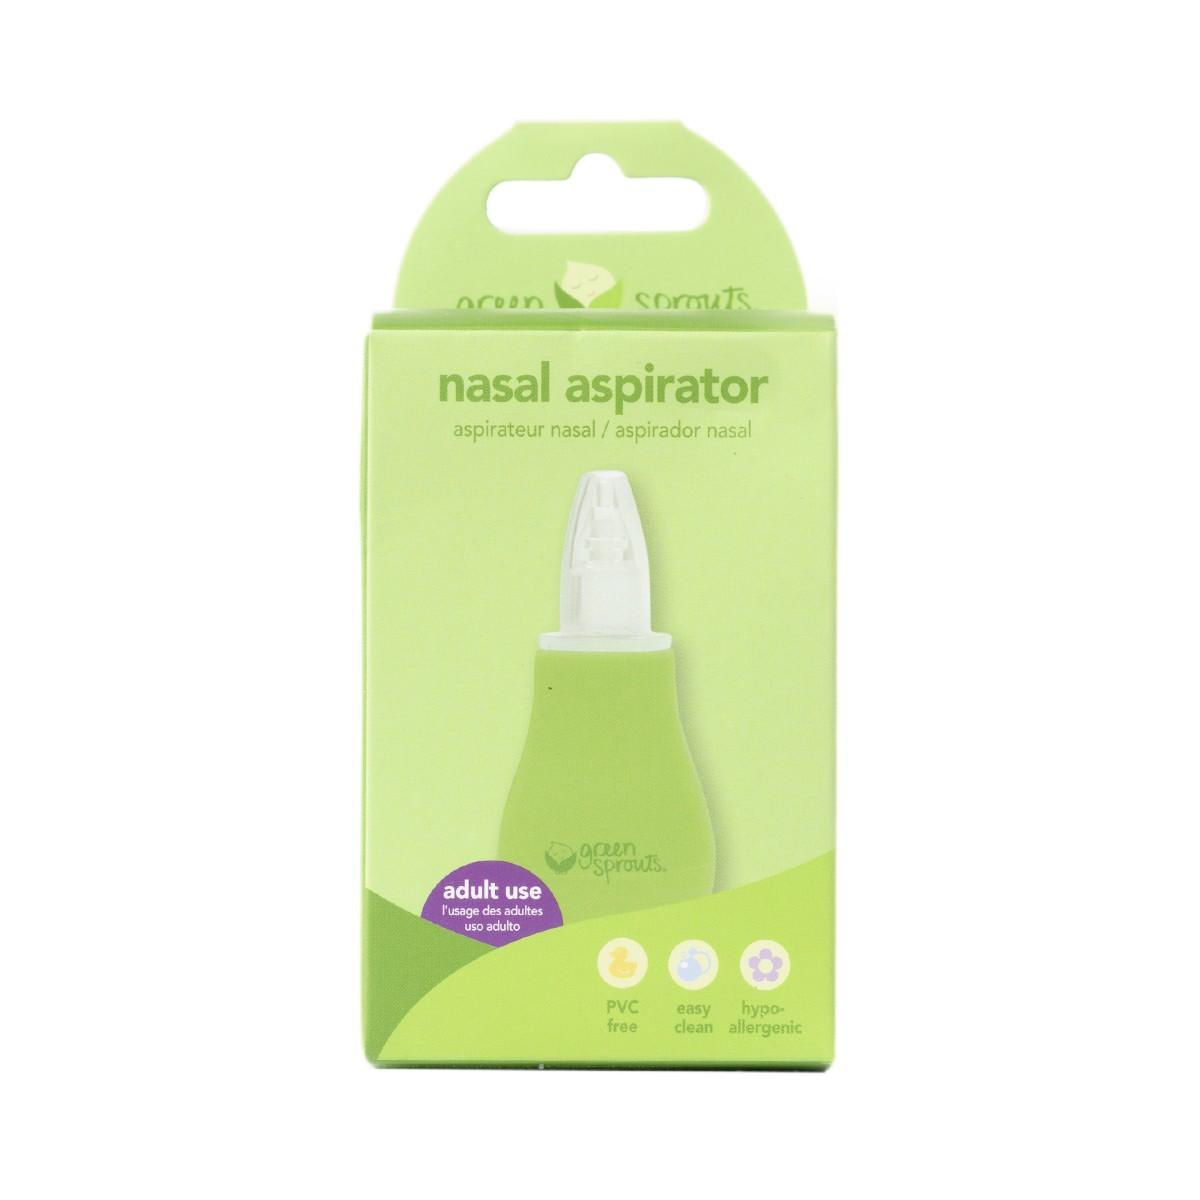 Green Sprouts Nasal Aspirator Thrive Market